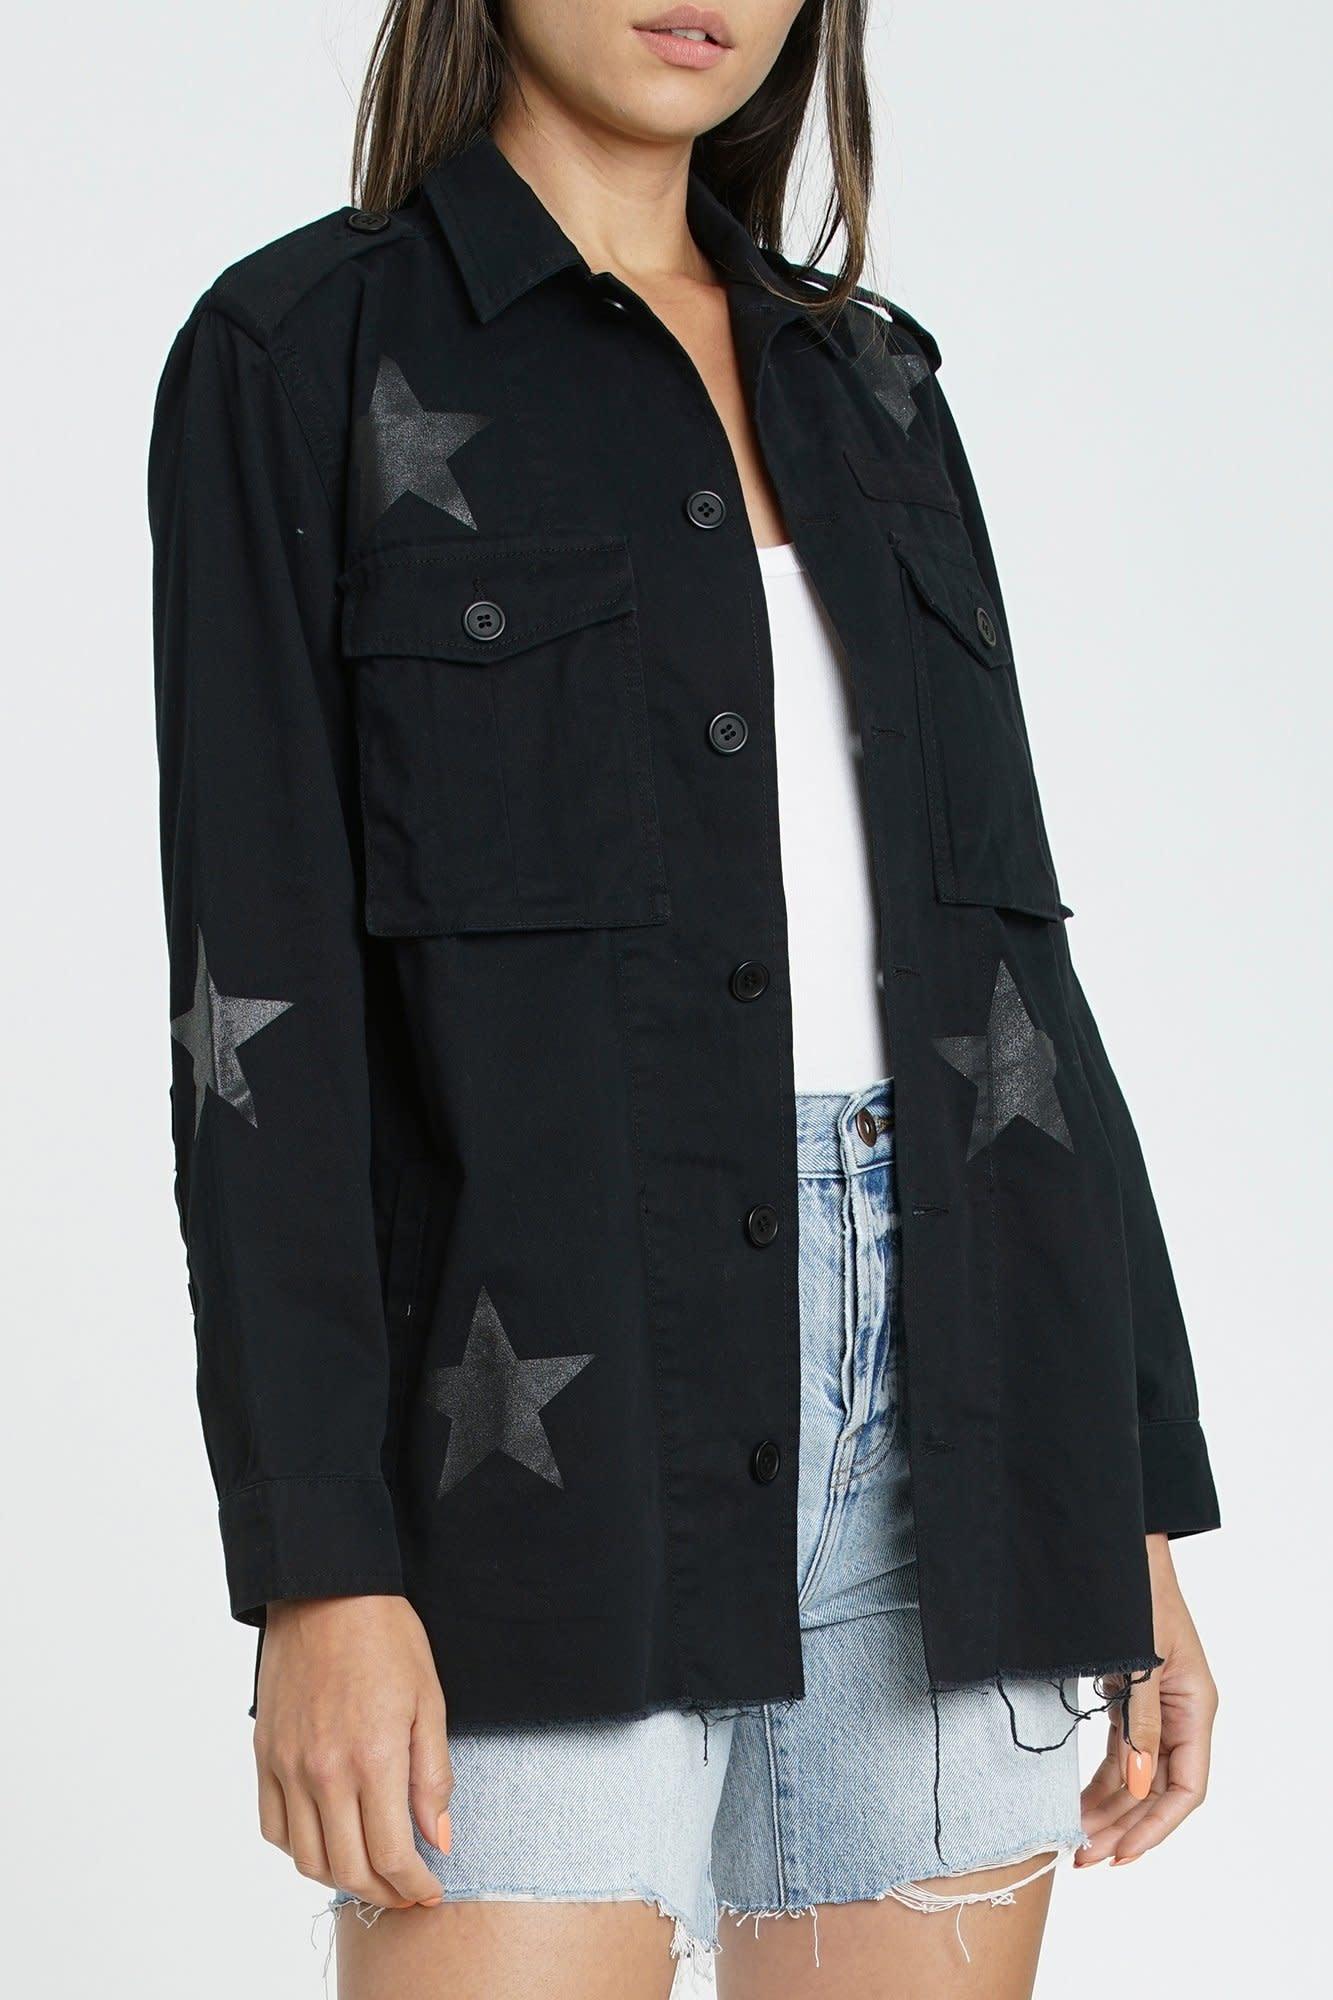 Atikshop Camilo Military jacket